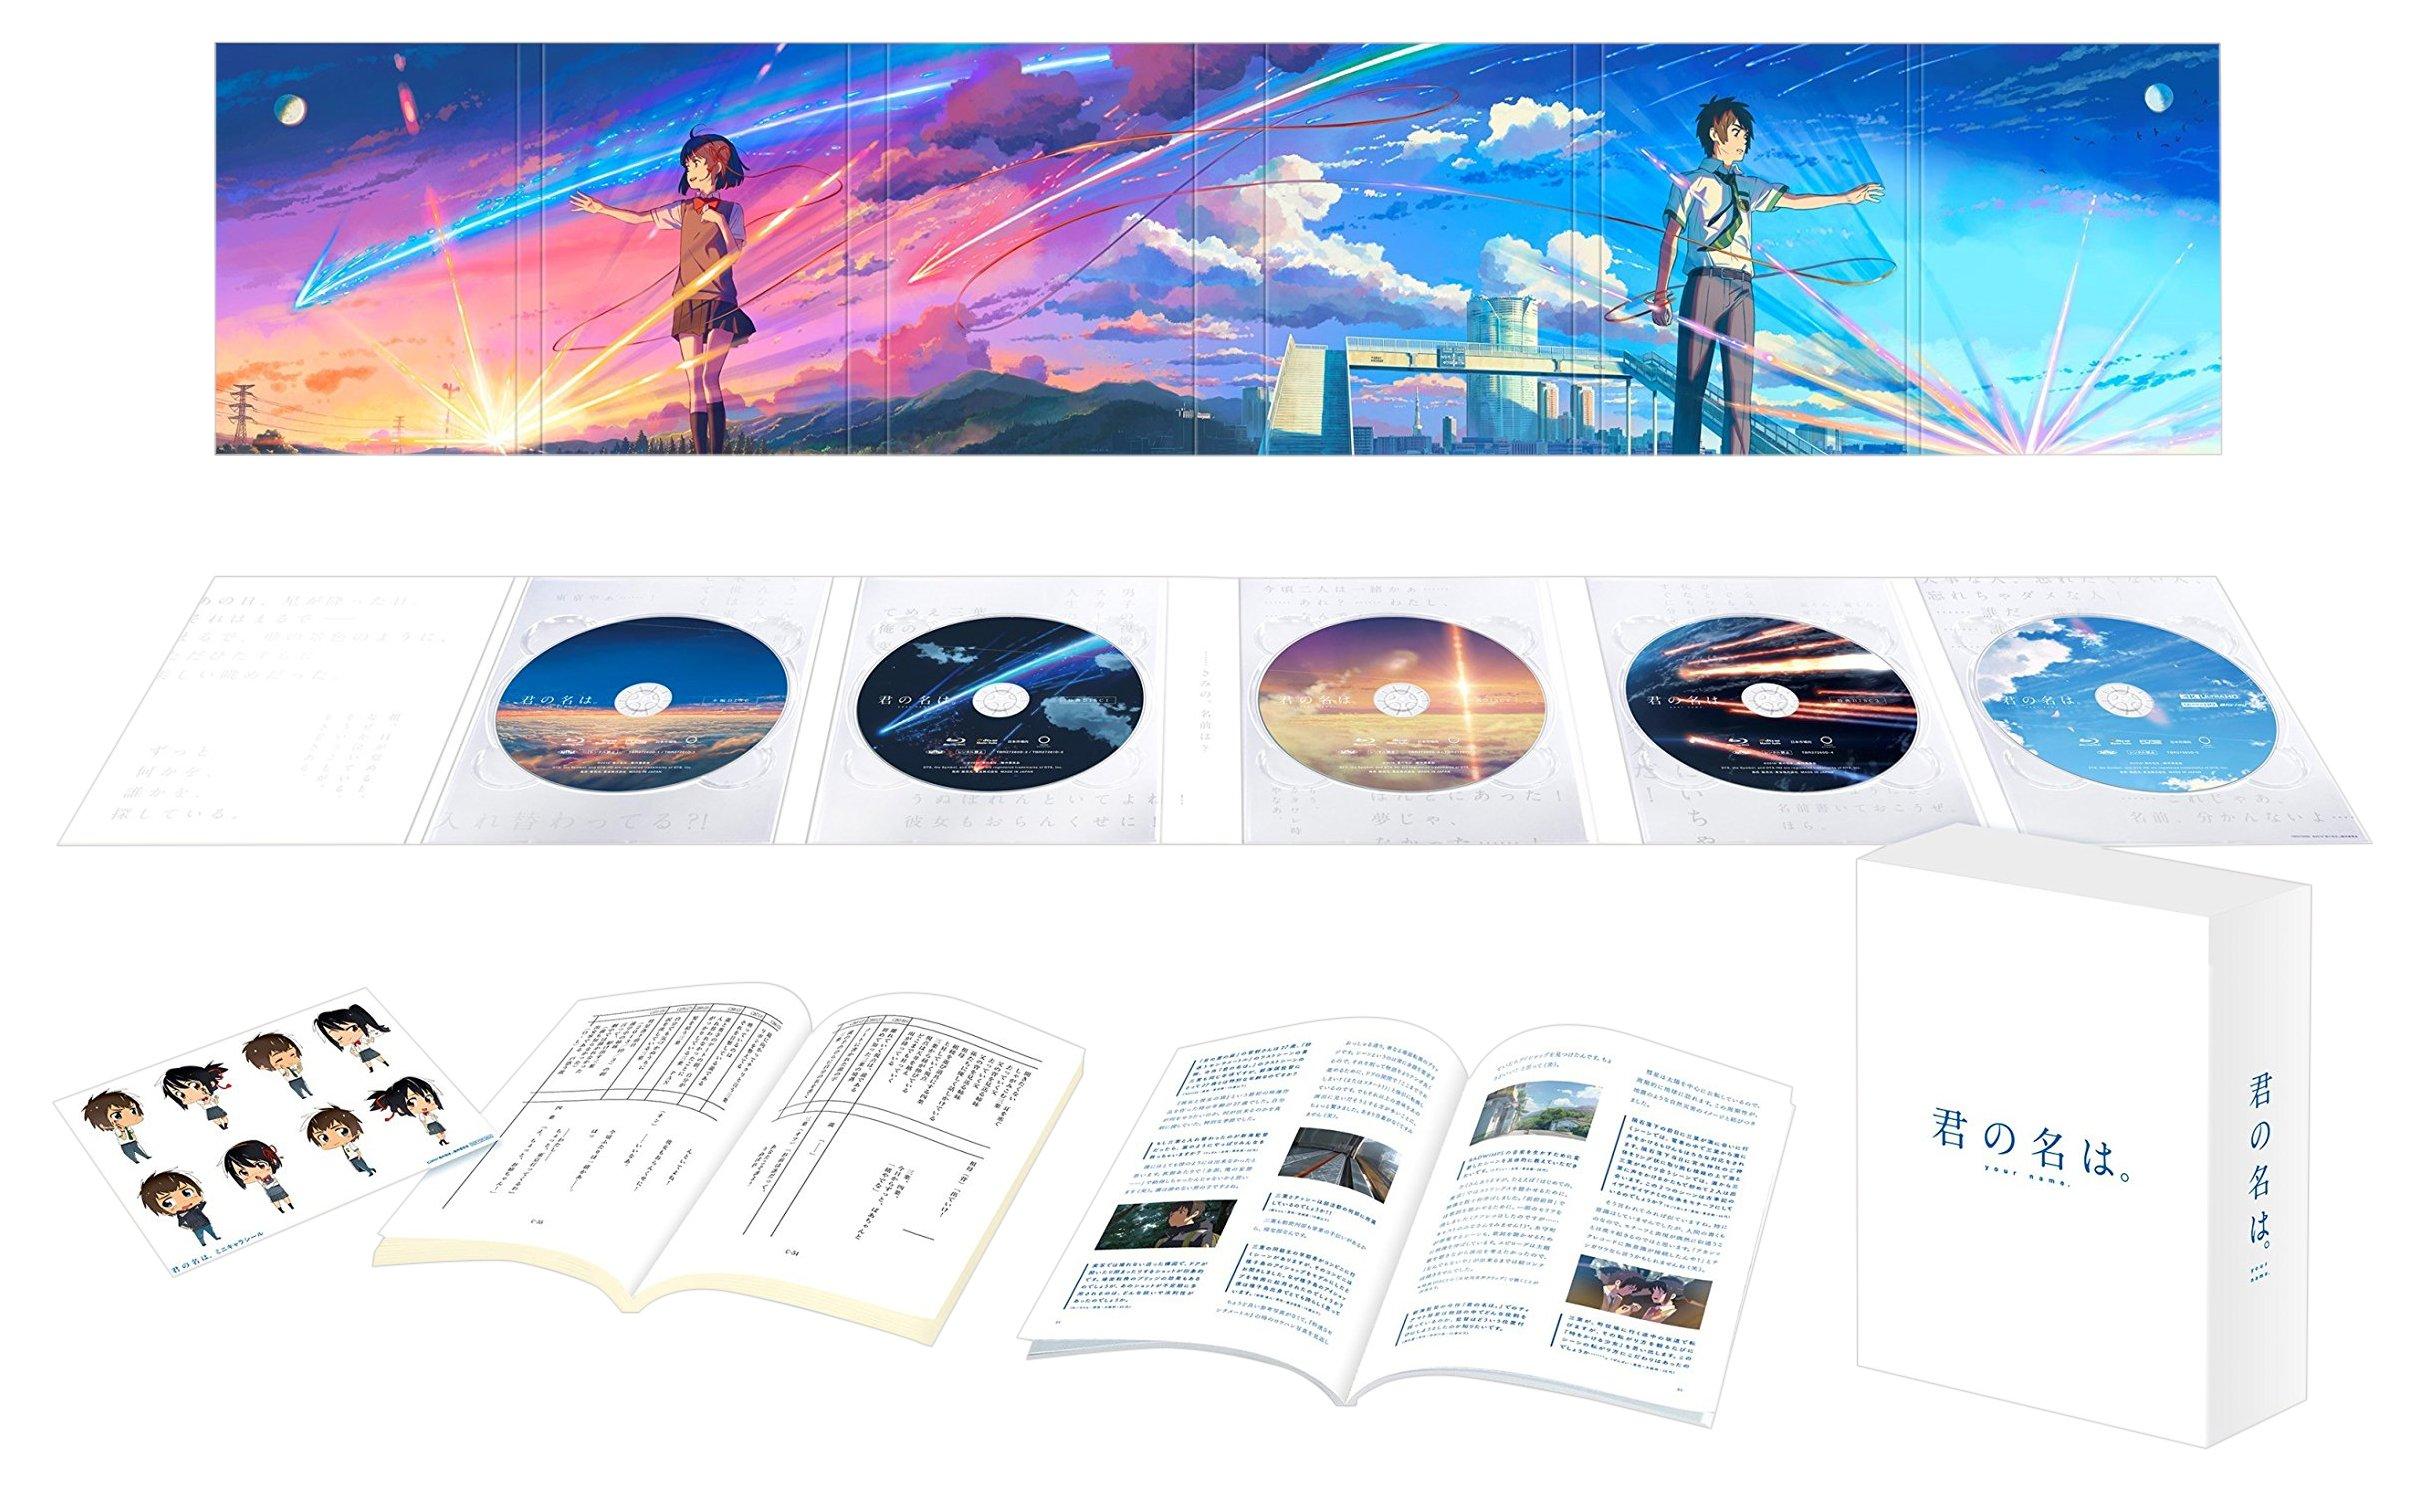 【Amazon.co.jp限定】「君の名は。」Blu-rayコレクターズ・エディション 4K Ultra HD Blu-ray同梱5枚組 (初回生産限定)(早期購入特典:特製フィルムしおり付き)(オリジナル特典:描き下ろしA4特製フレーム 高画質印刷+特殊加工ポストカード2枚組付き)